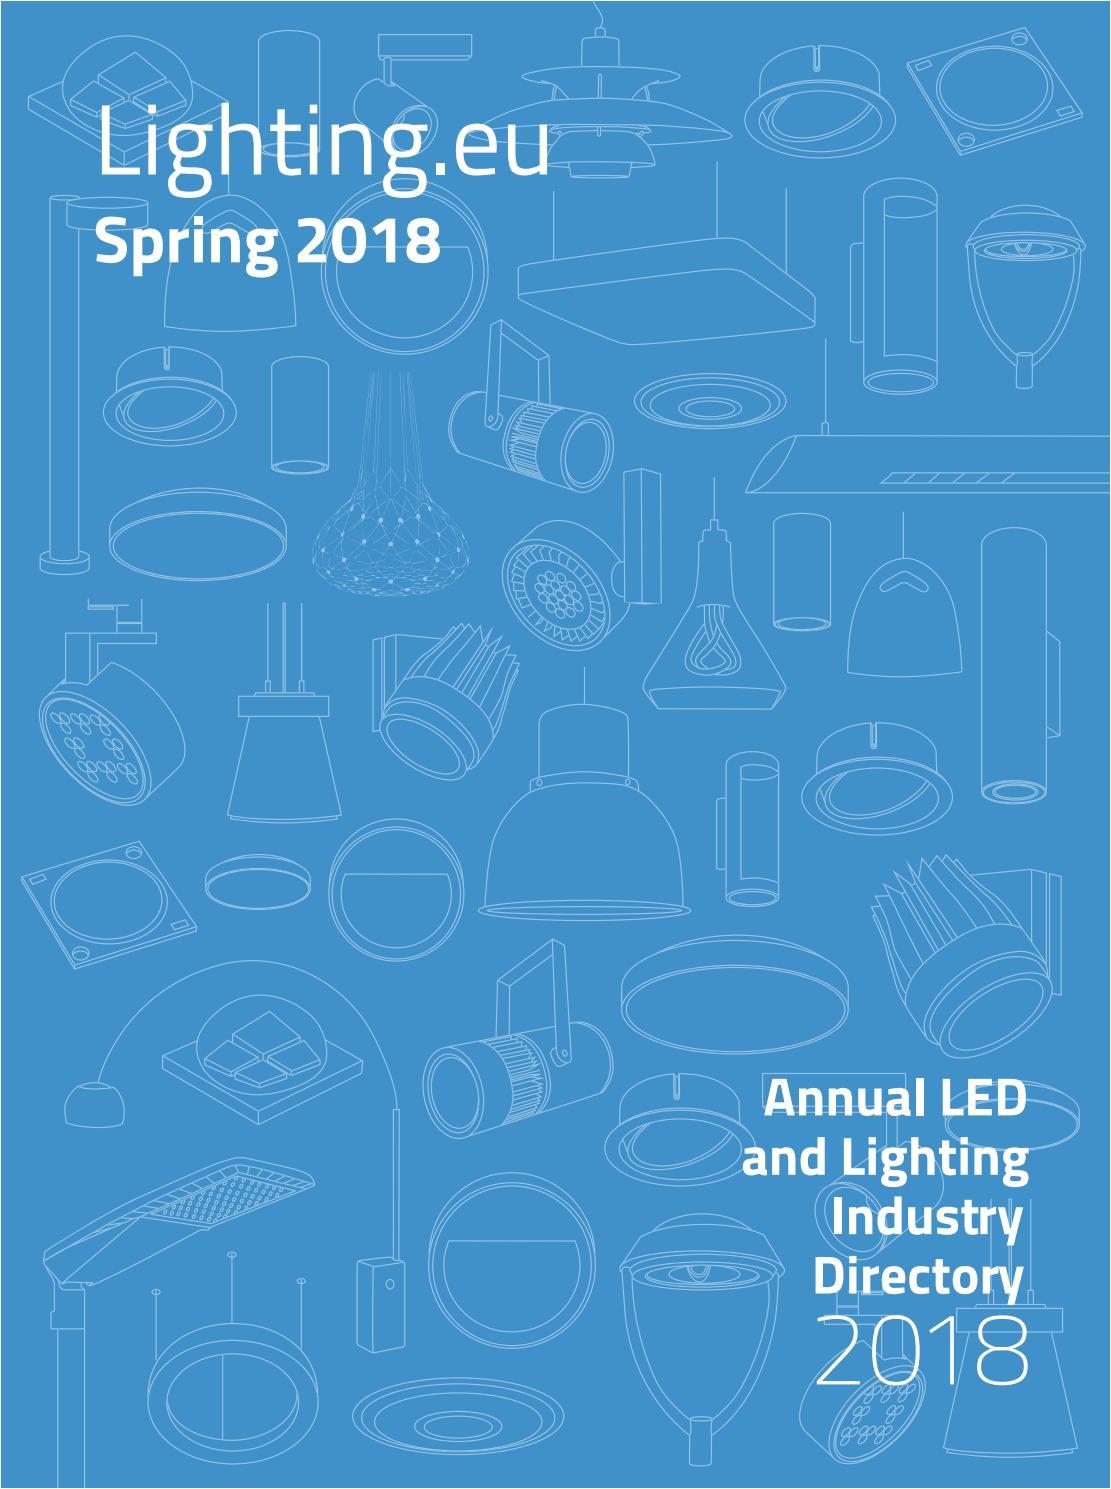 Blackboard Vista San Diego Mesa College Lighting Eu Spring 2018 by Lighting Eu issuu